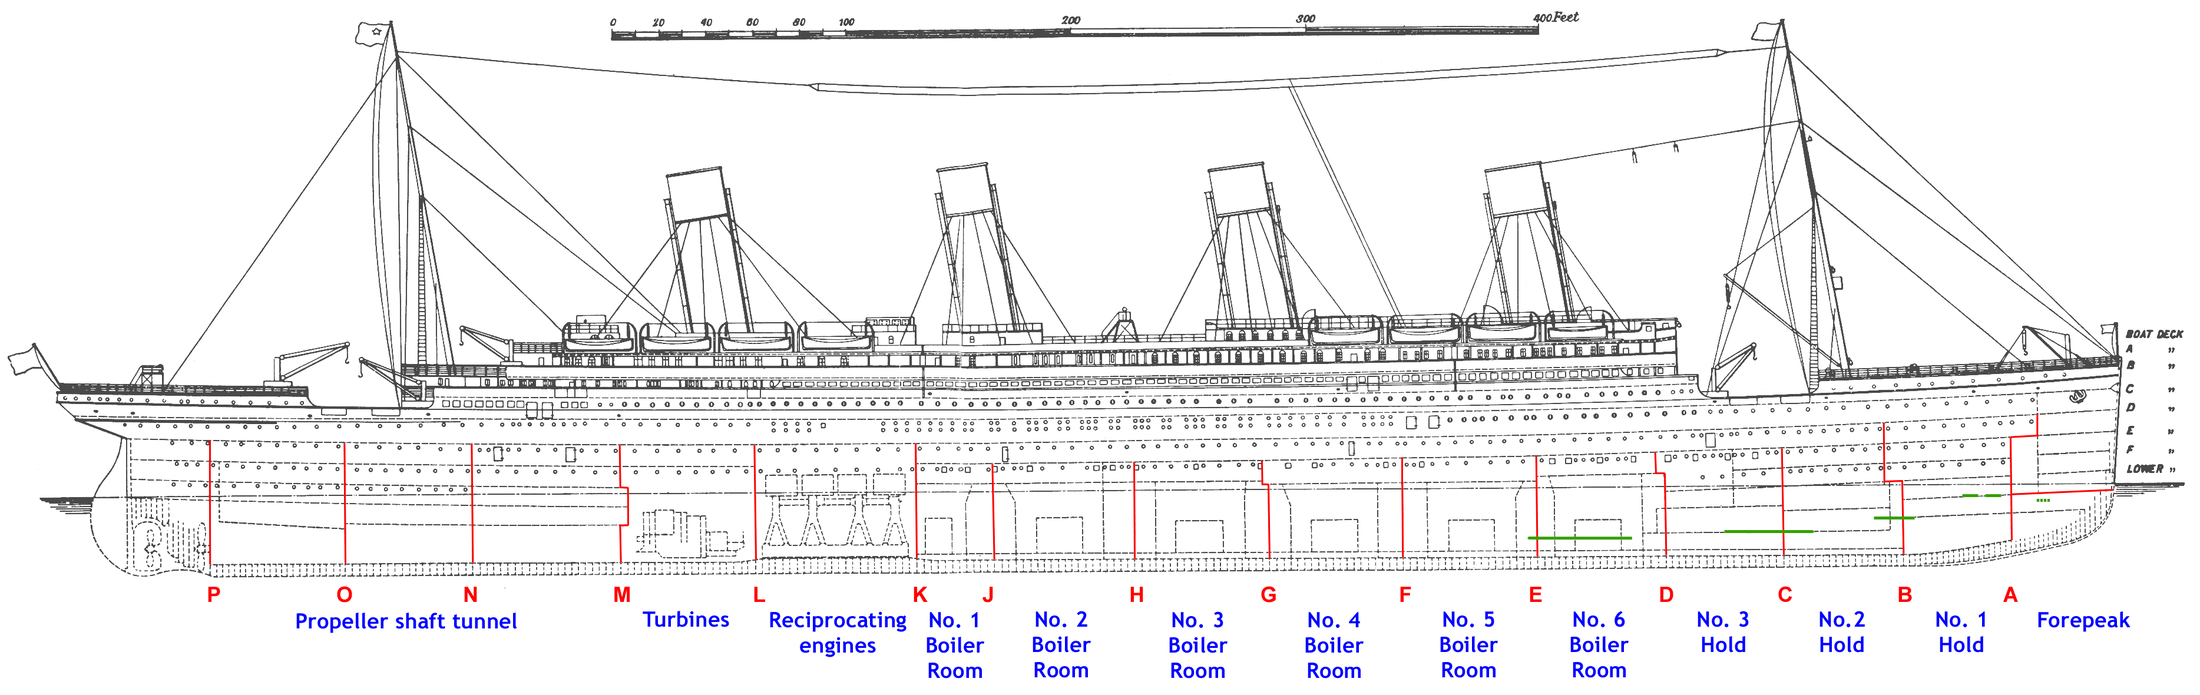 diagram of rms titanic history rms titanic, titanic, titanic deaths Titanic Boat Drawing diagram of rms titanic